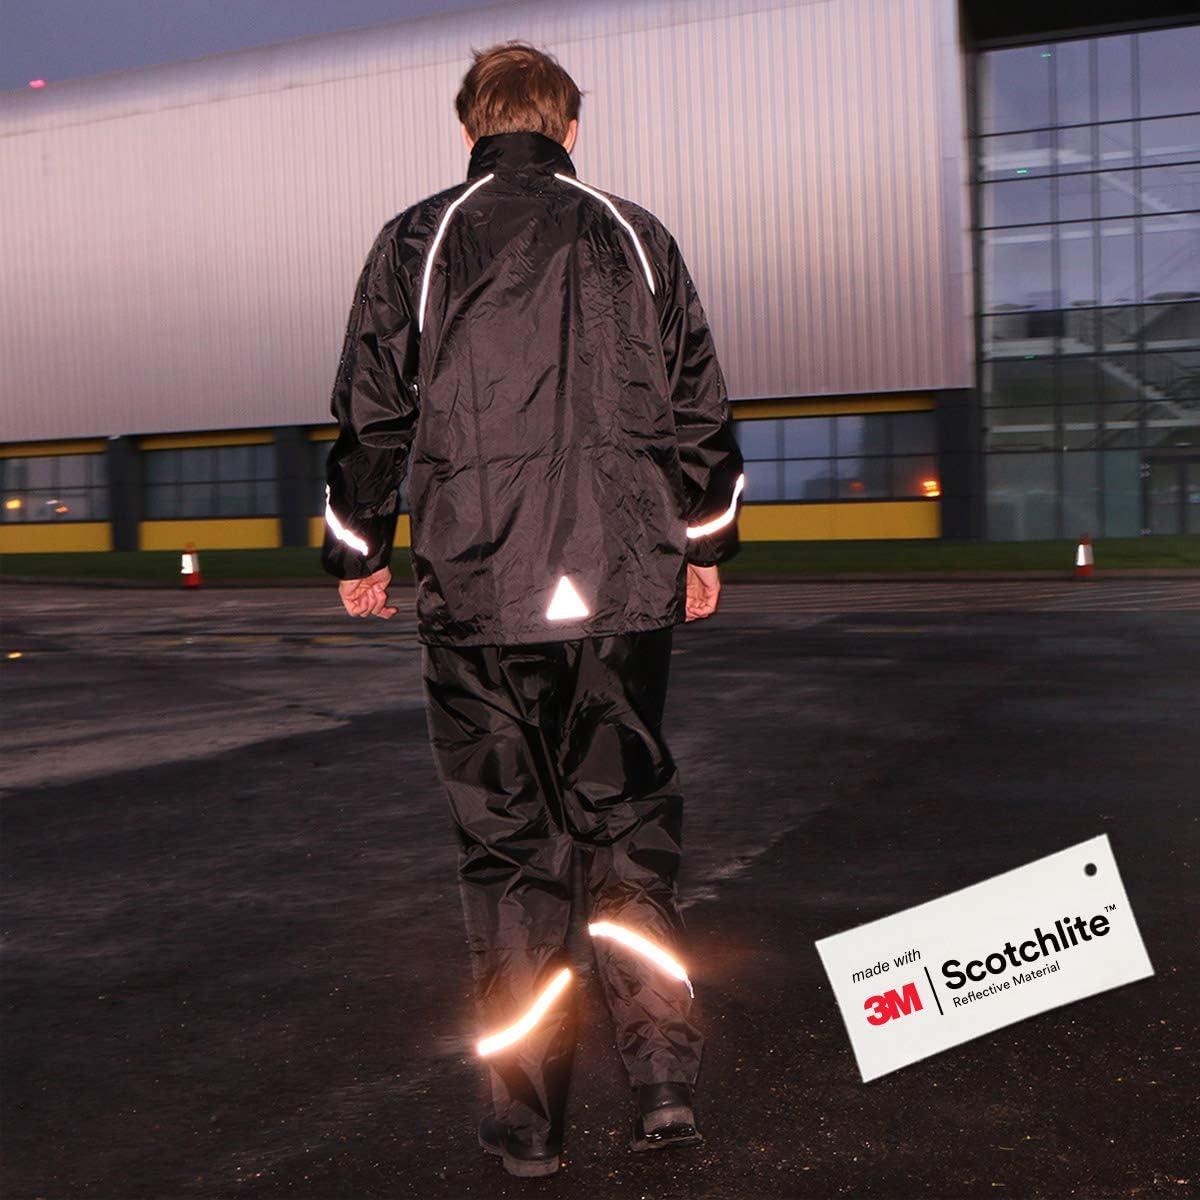 Reflective Rainsuit made with 3M Scotchlite Salzmann 3M Waterproof